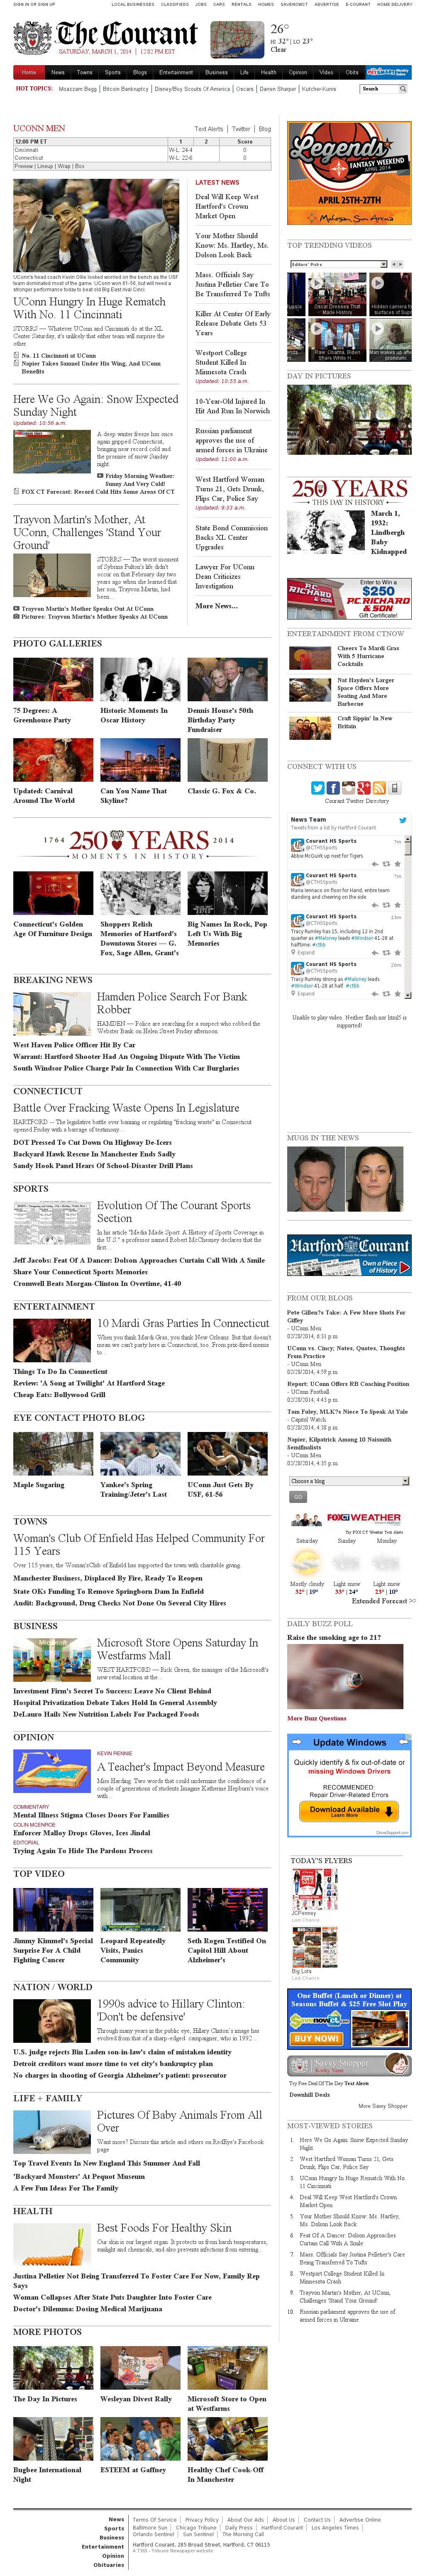 Hartford Courant at Saturday March 1, 2014, 5:07 p.m. UTC